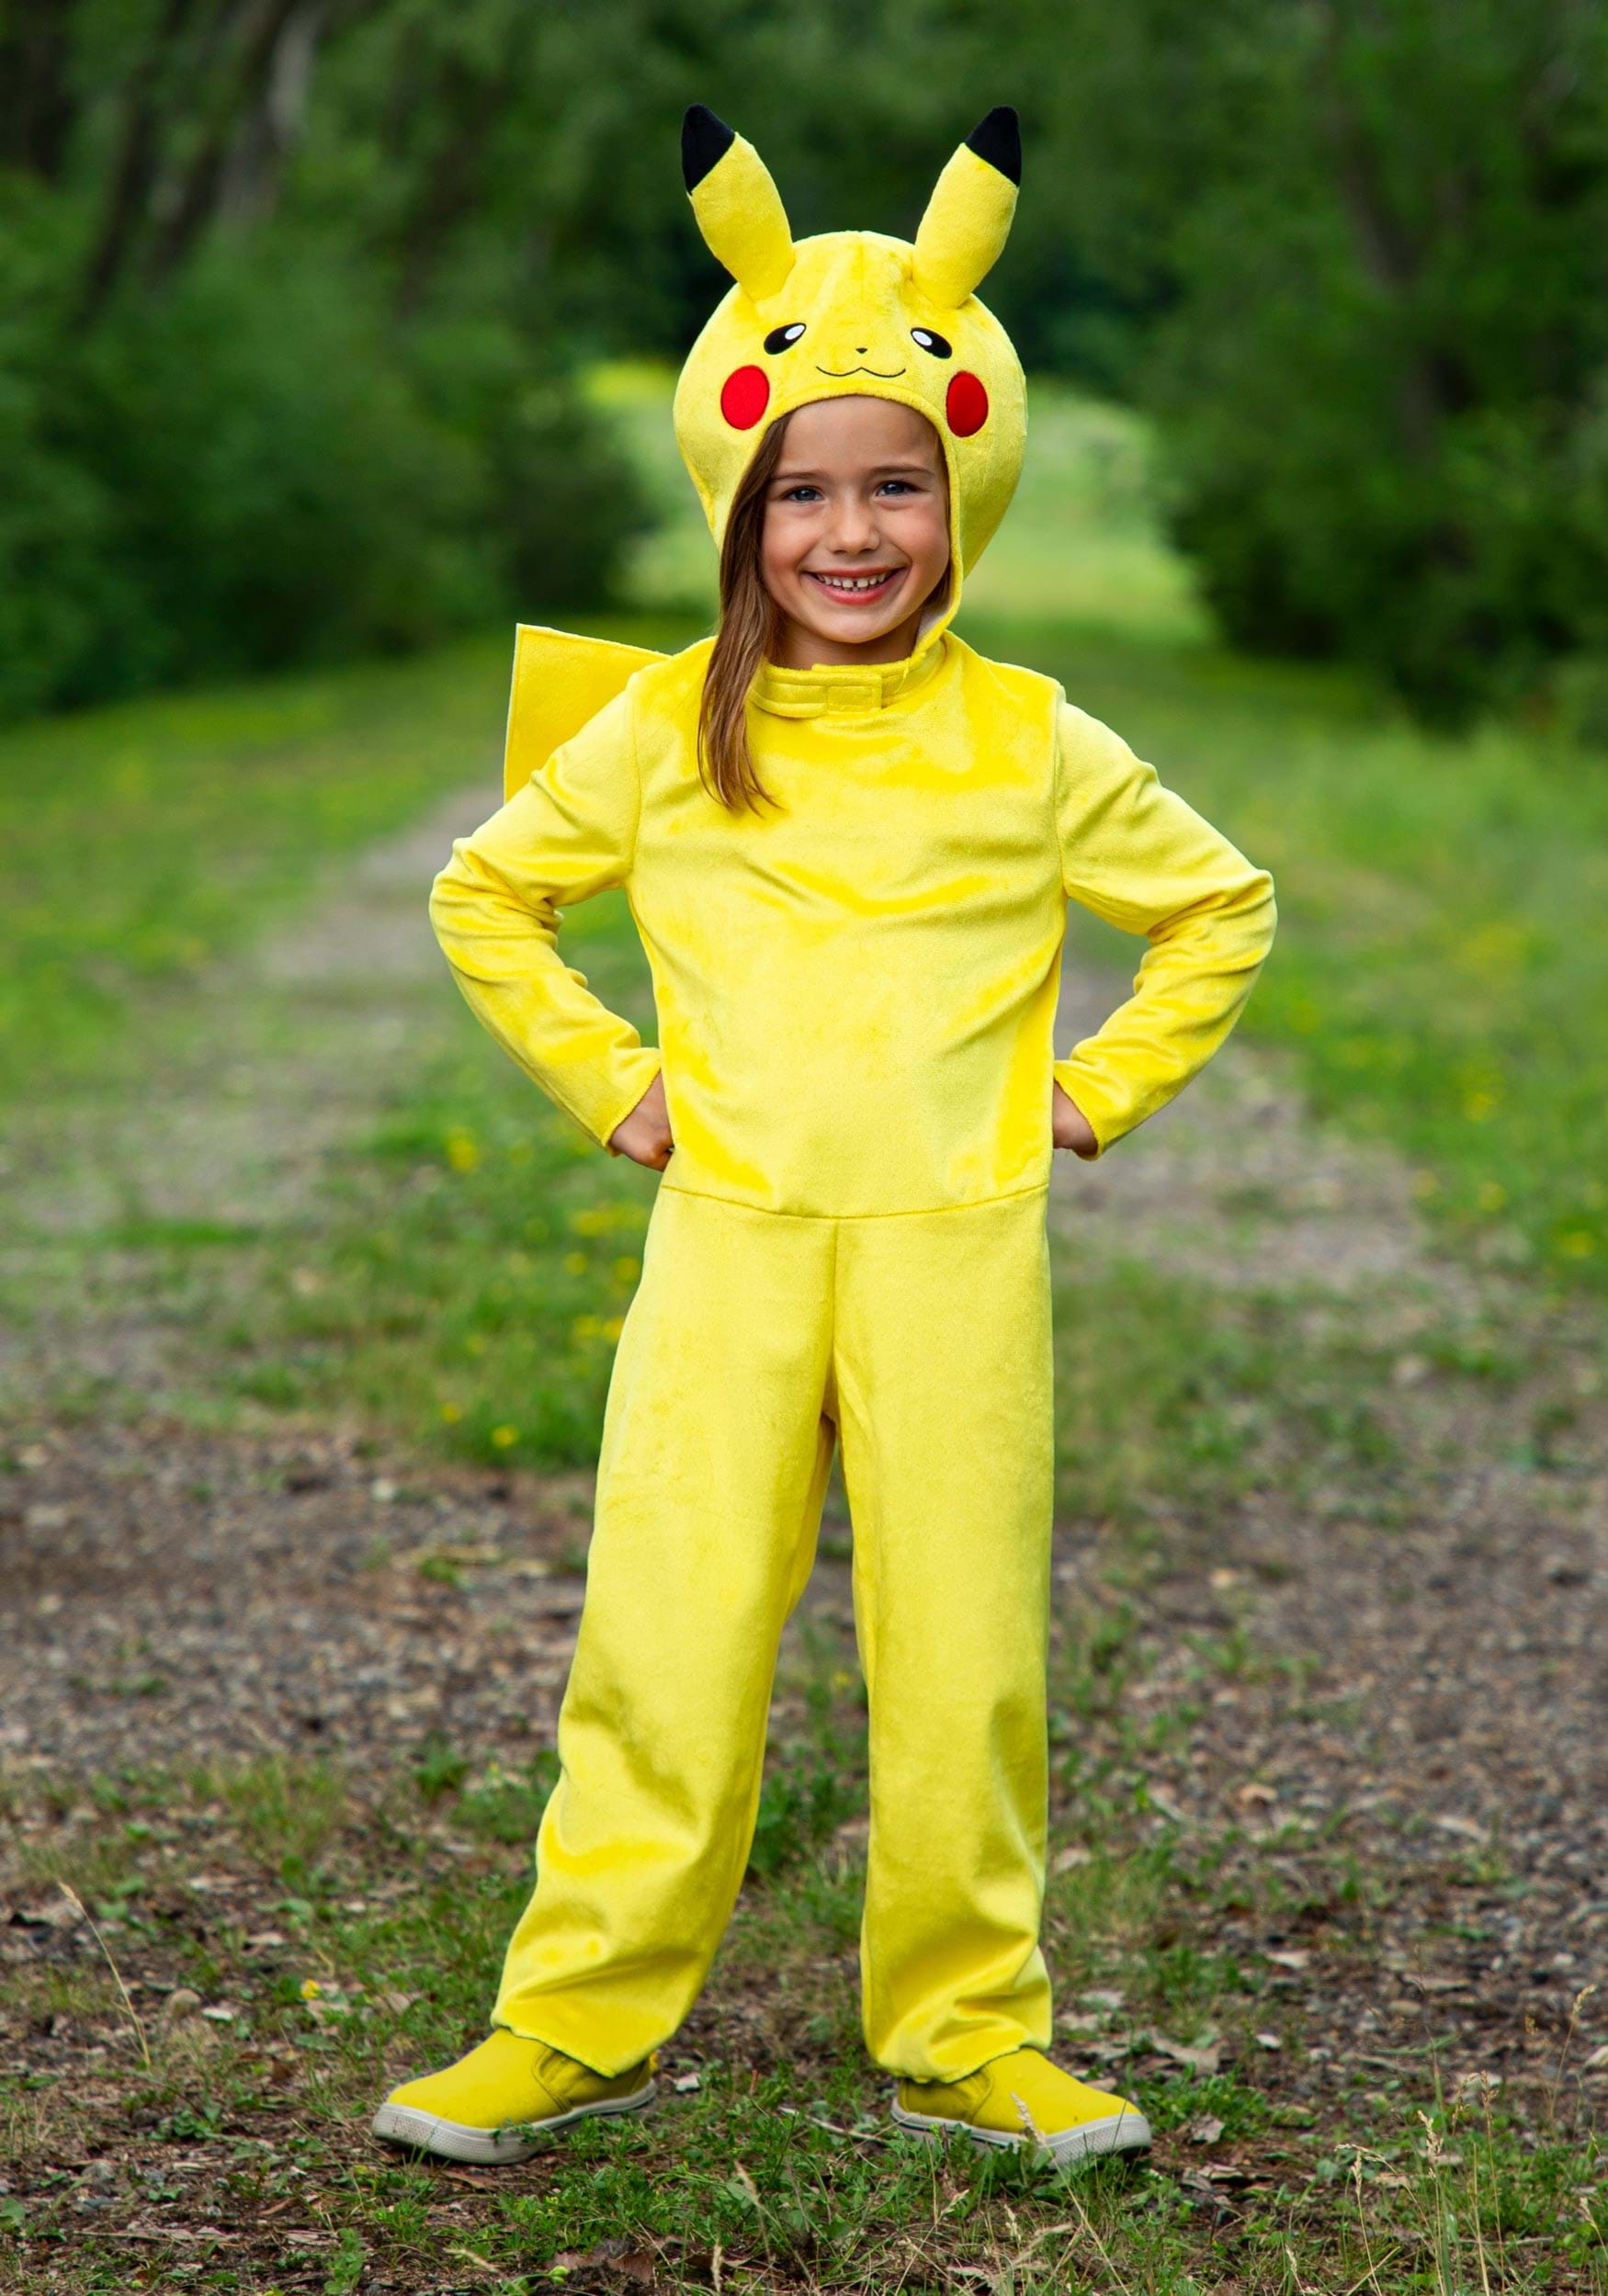 The Pokemon Child Pikachu Classic Costume